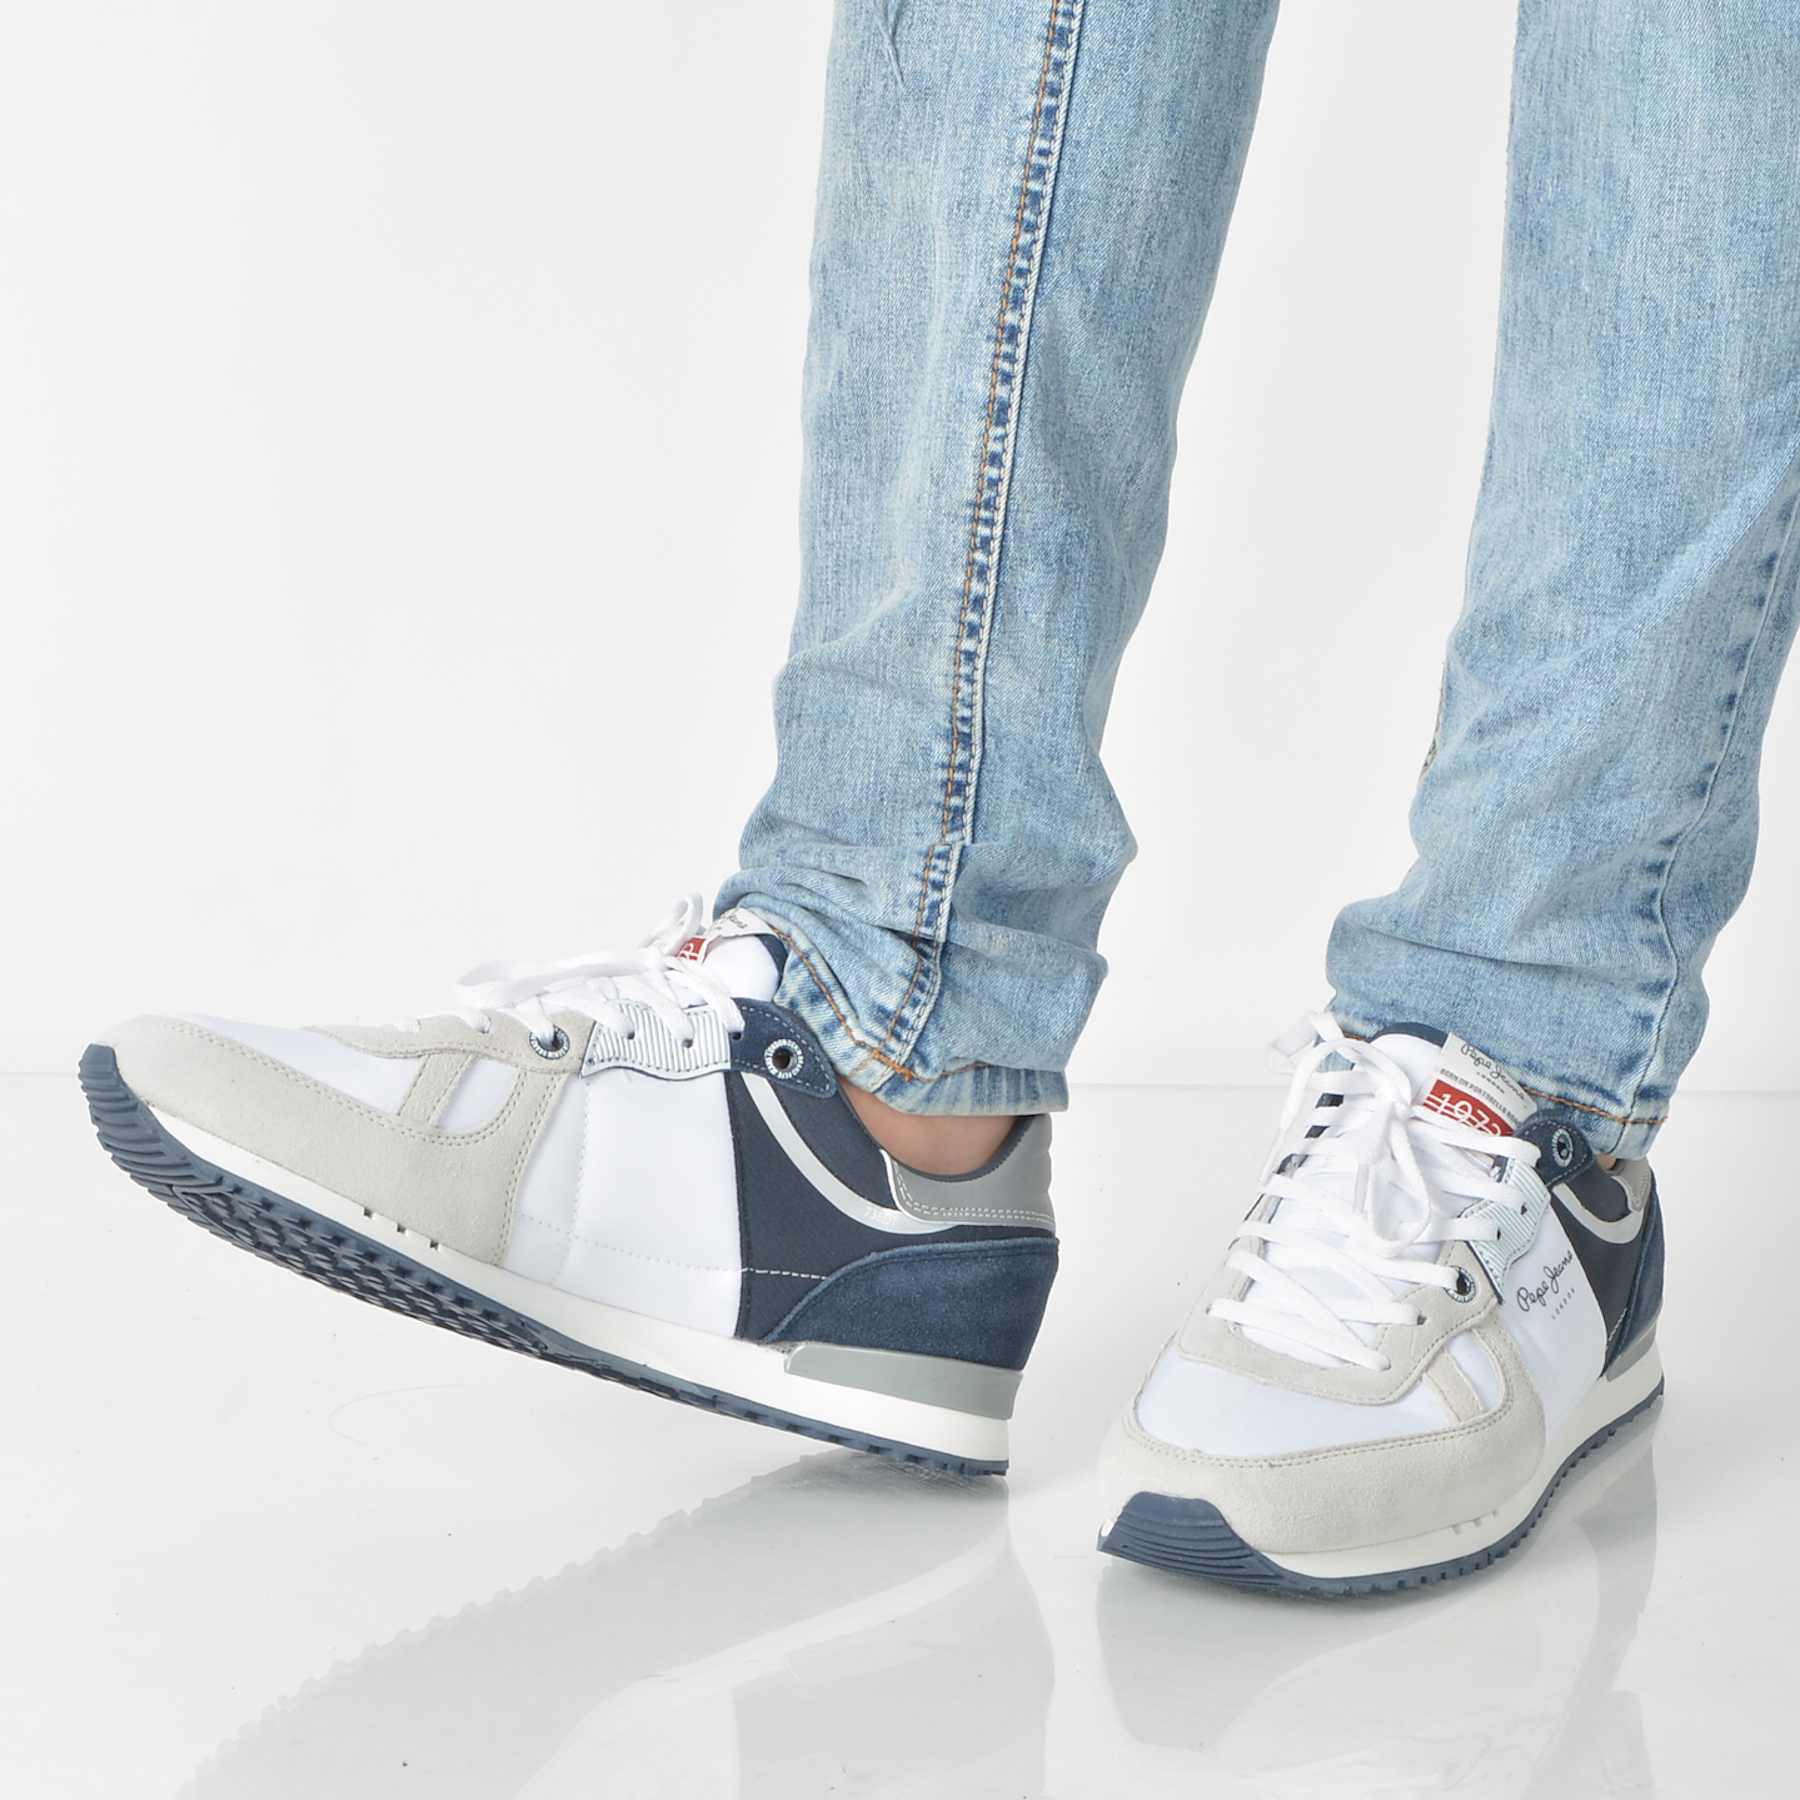 Pantofi Sport Pepe Jeans Albi, Ms30415, Din Material Textil